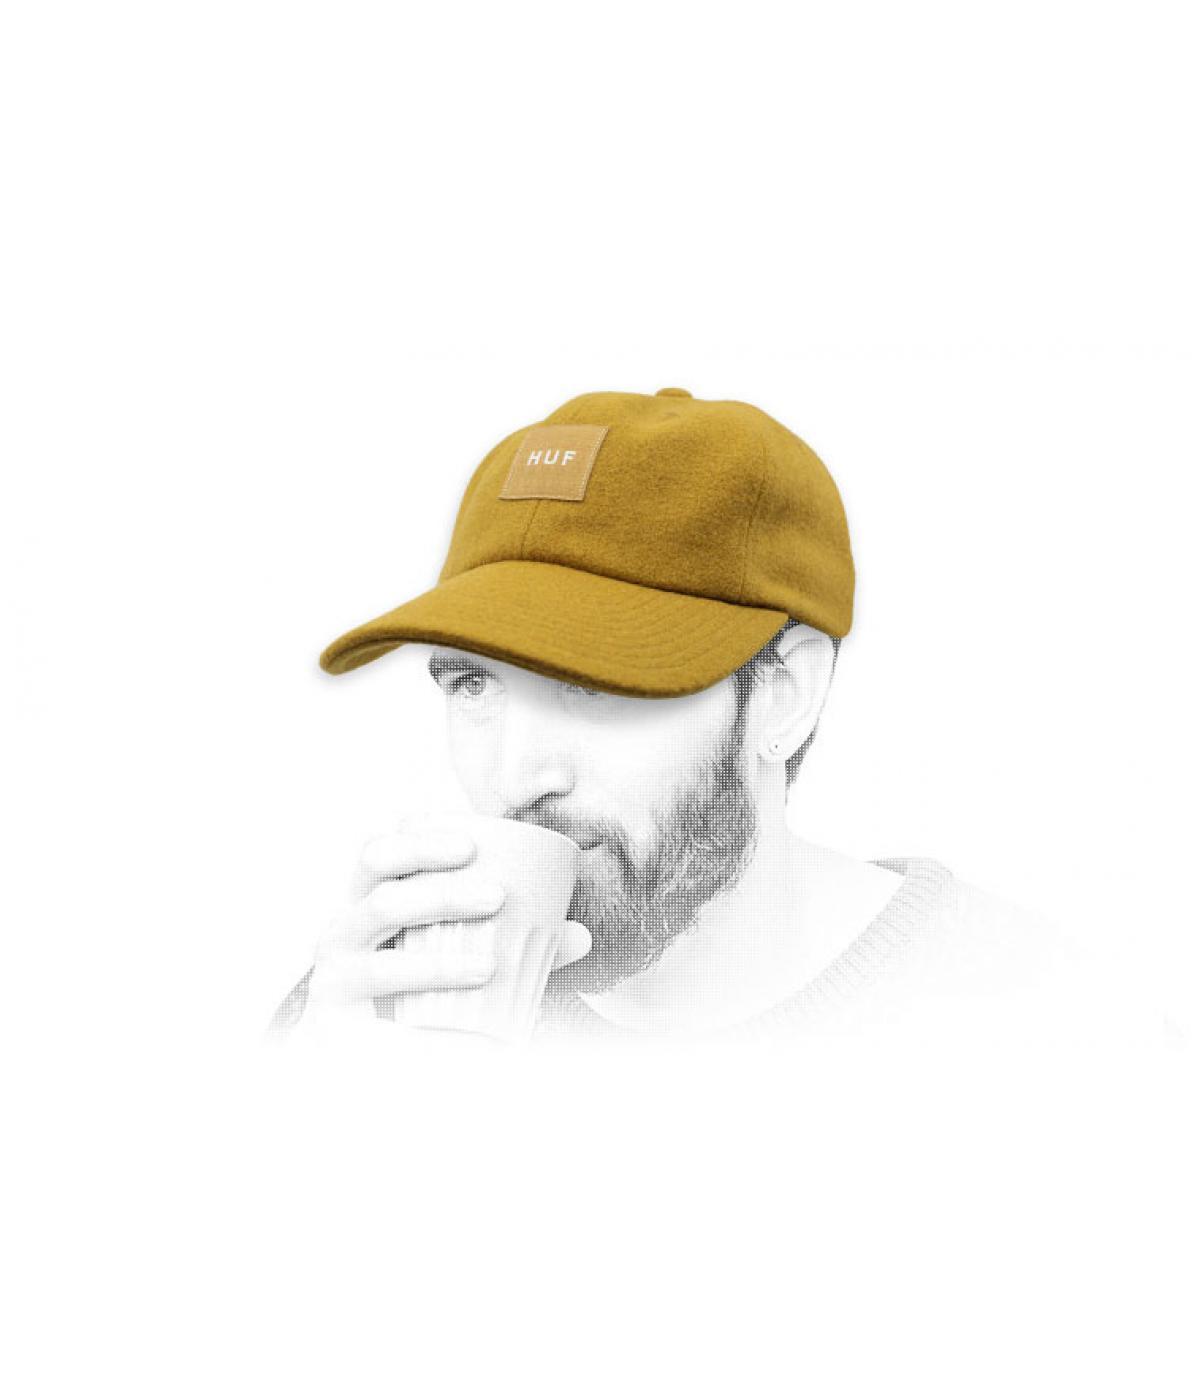 Cap Melton Wolle Huf gelb